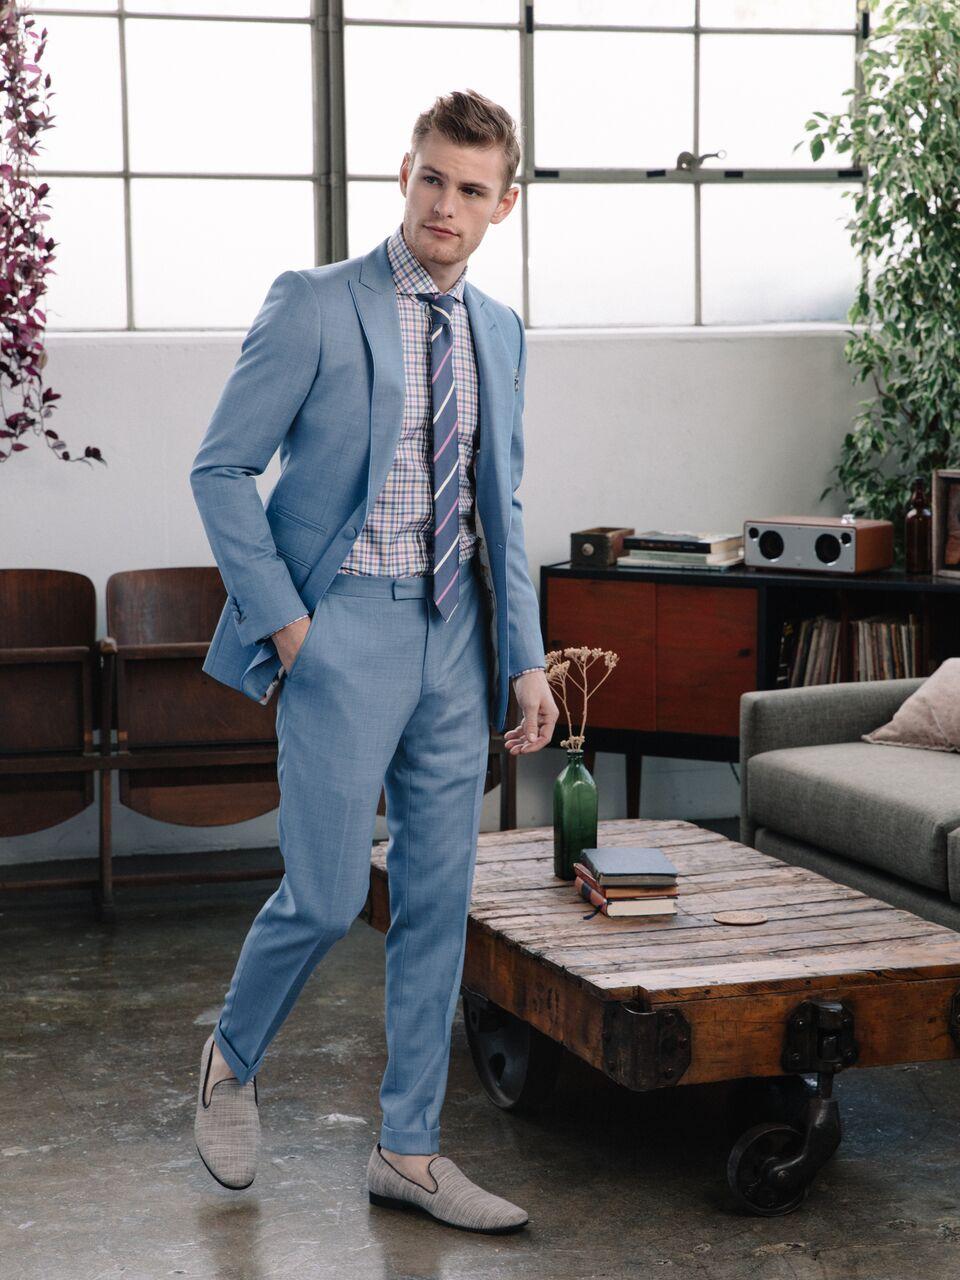 Model - Noah Teicher (LA Models)  Made to Measure Suit. Ready-to-Wear Necktie  Klein Epstein & Parker - San Francisco